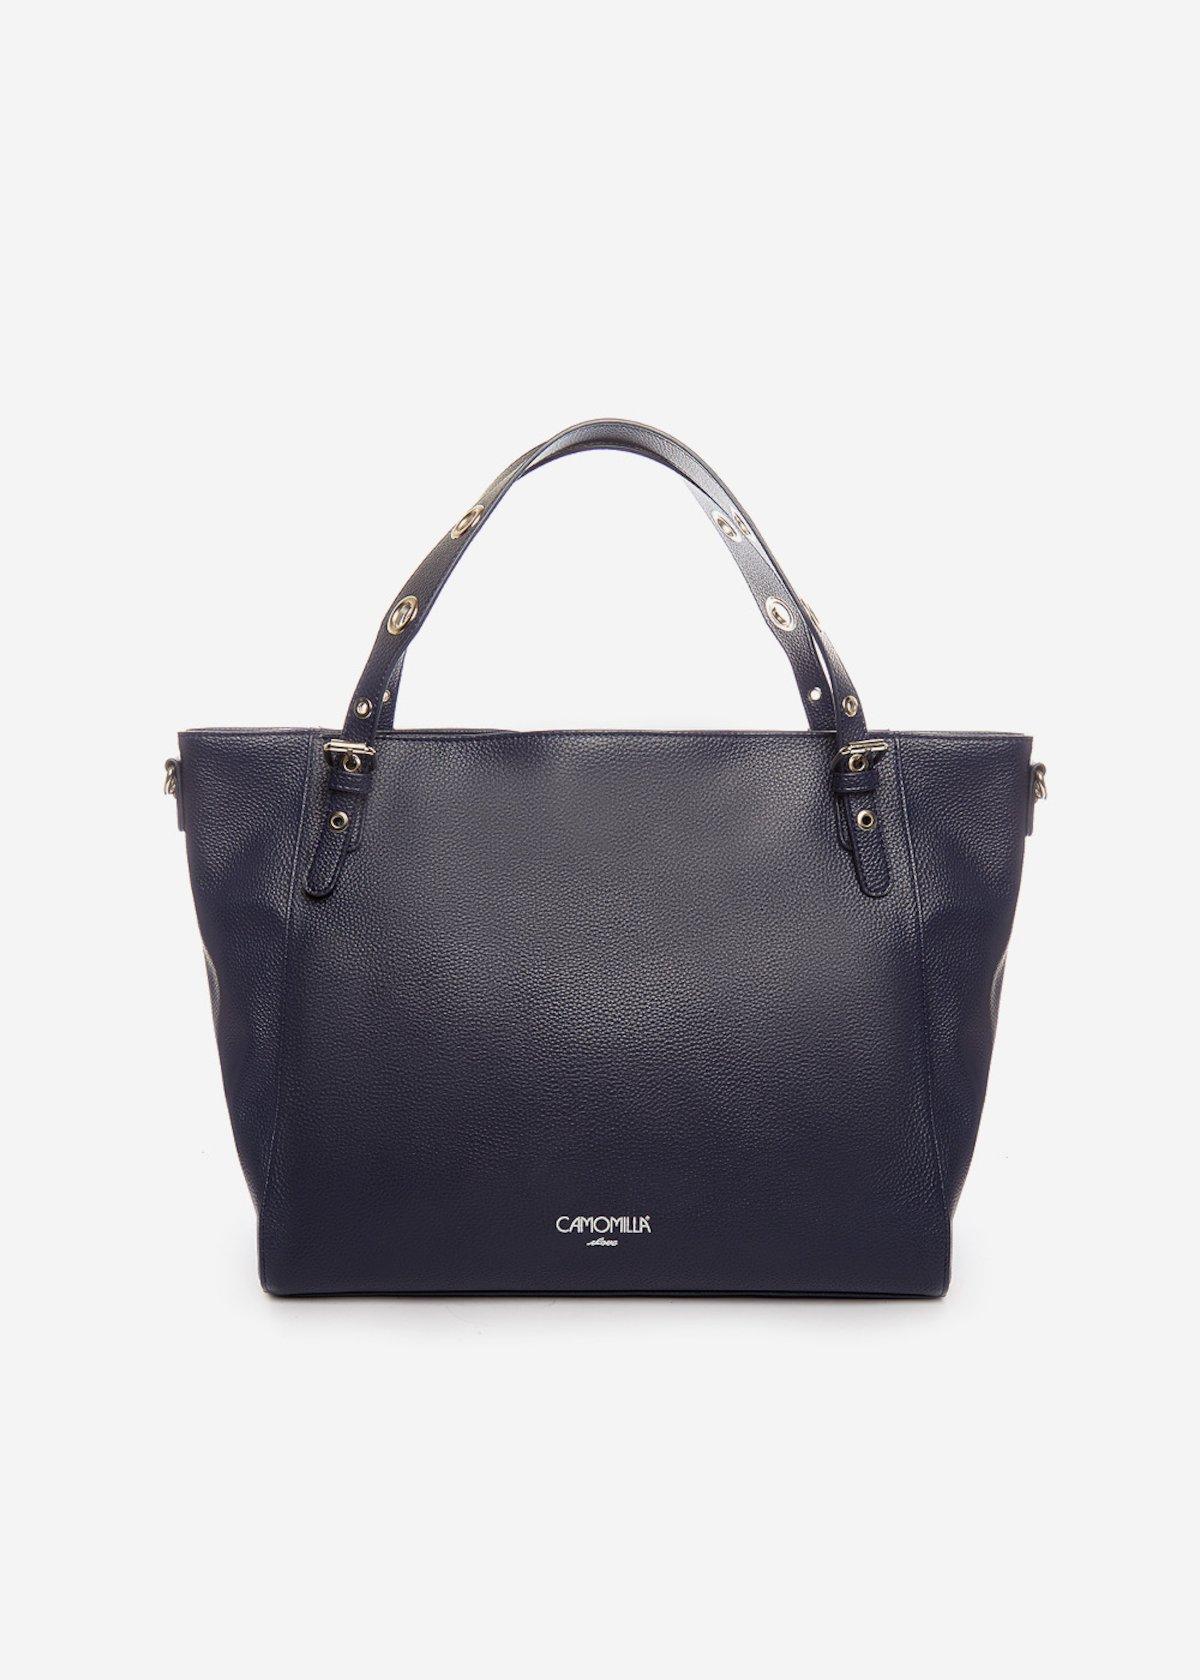 Bumpa Hobo Bag with eyelets on the handles - Medium Blue